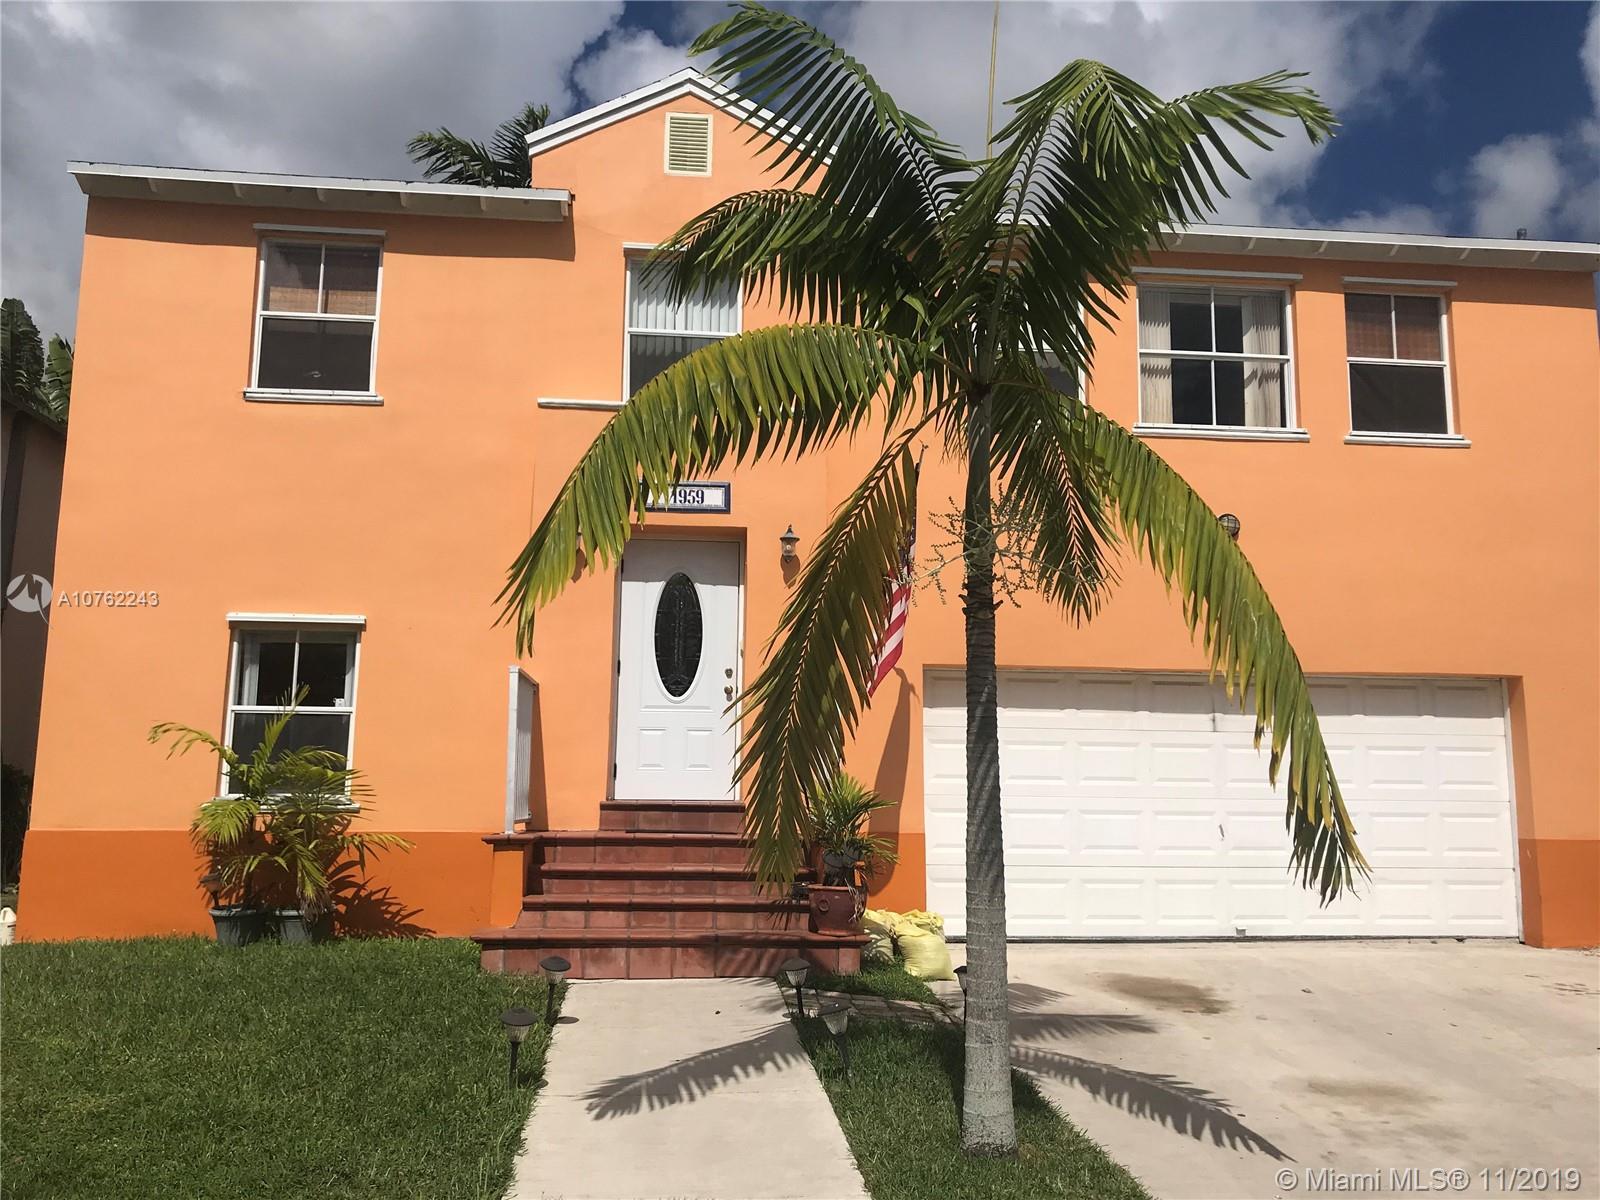 11959 SW 269th Ter, Homestead, FL 33032 - Homestead, FL real estate listing